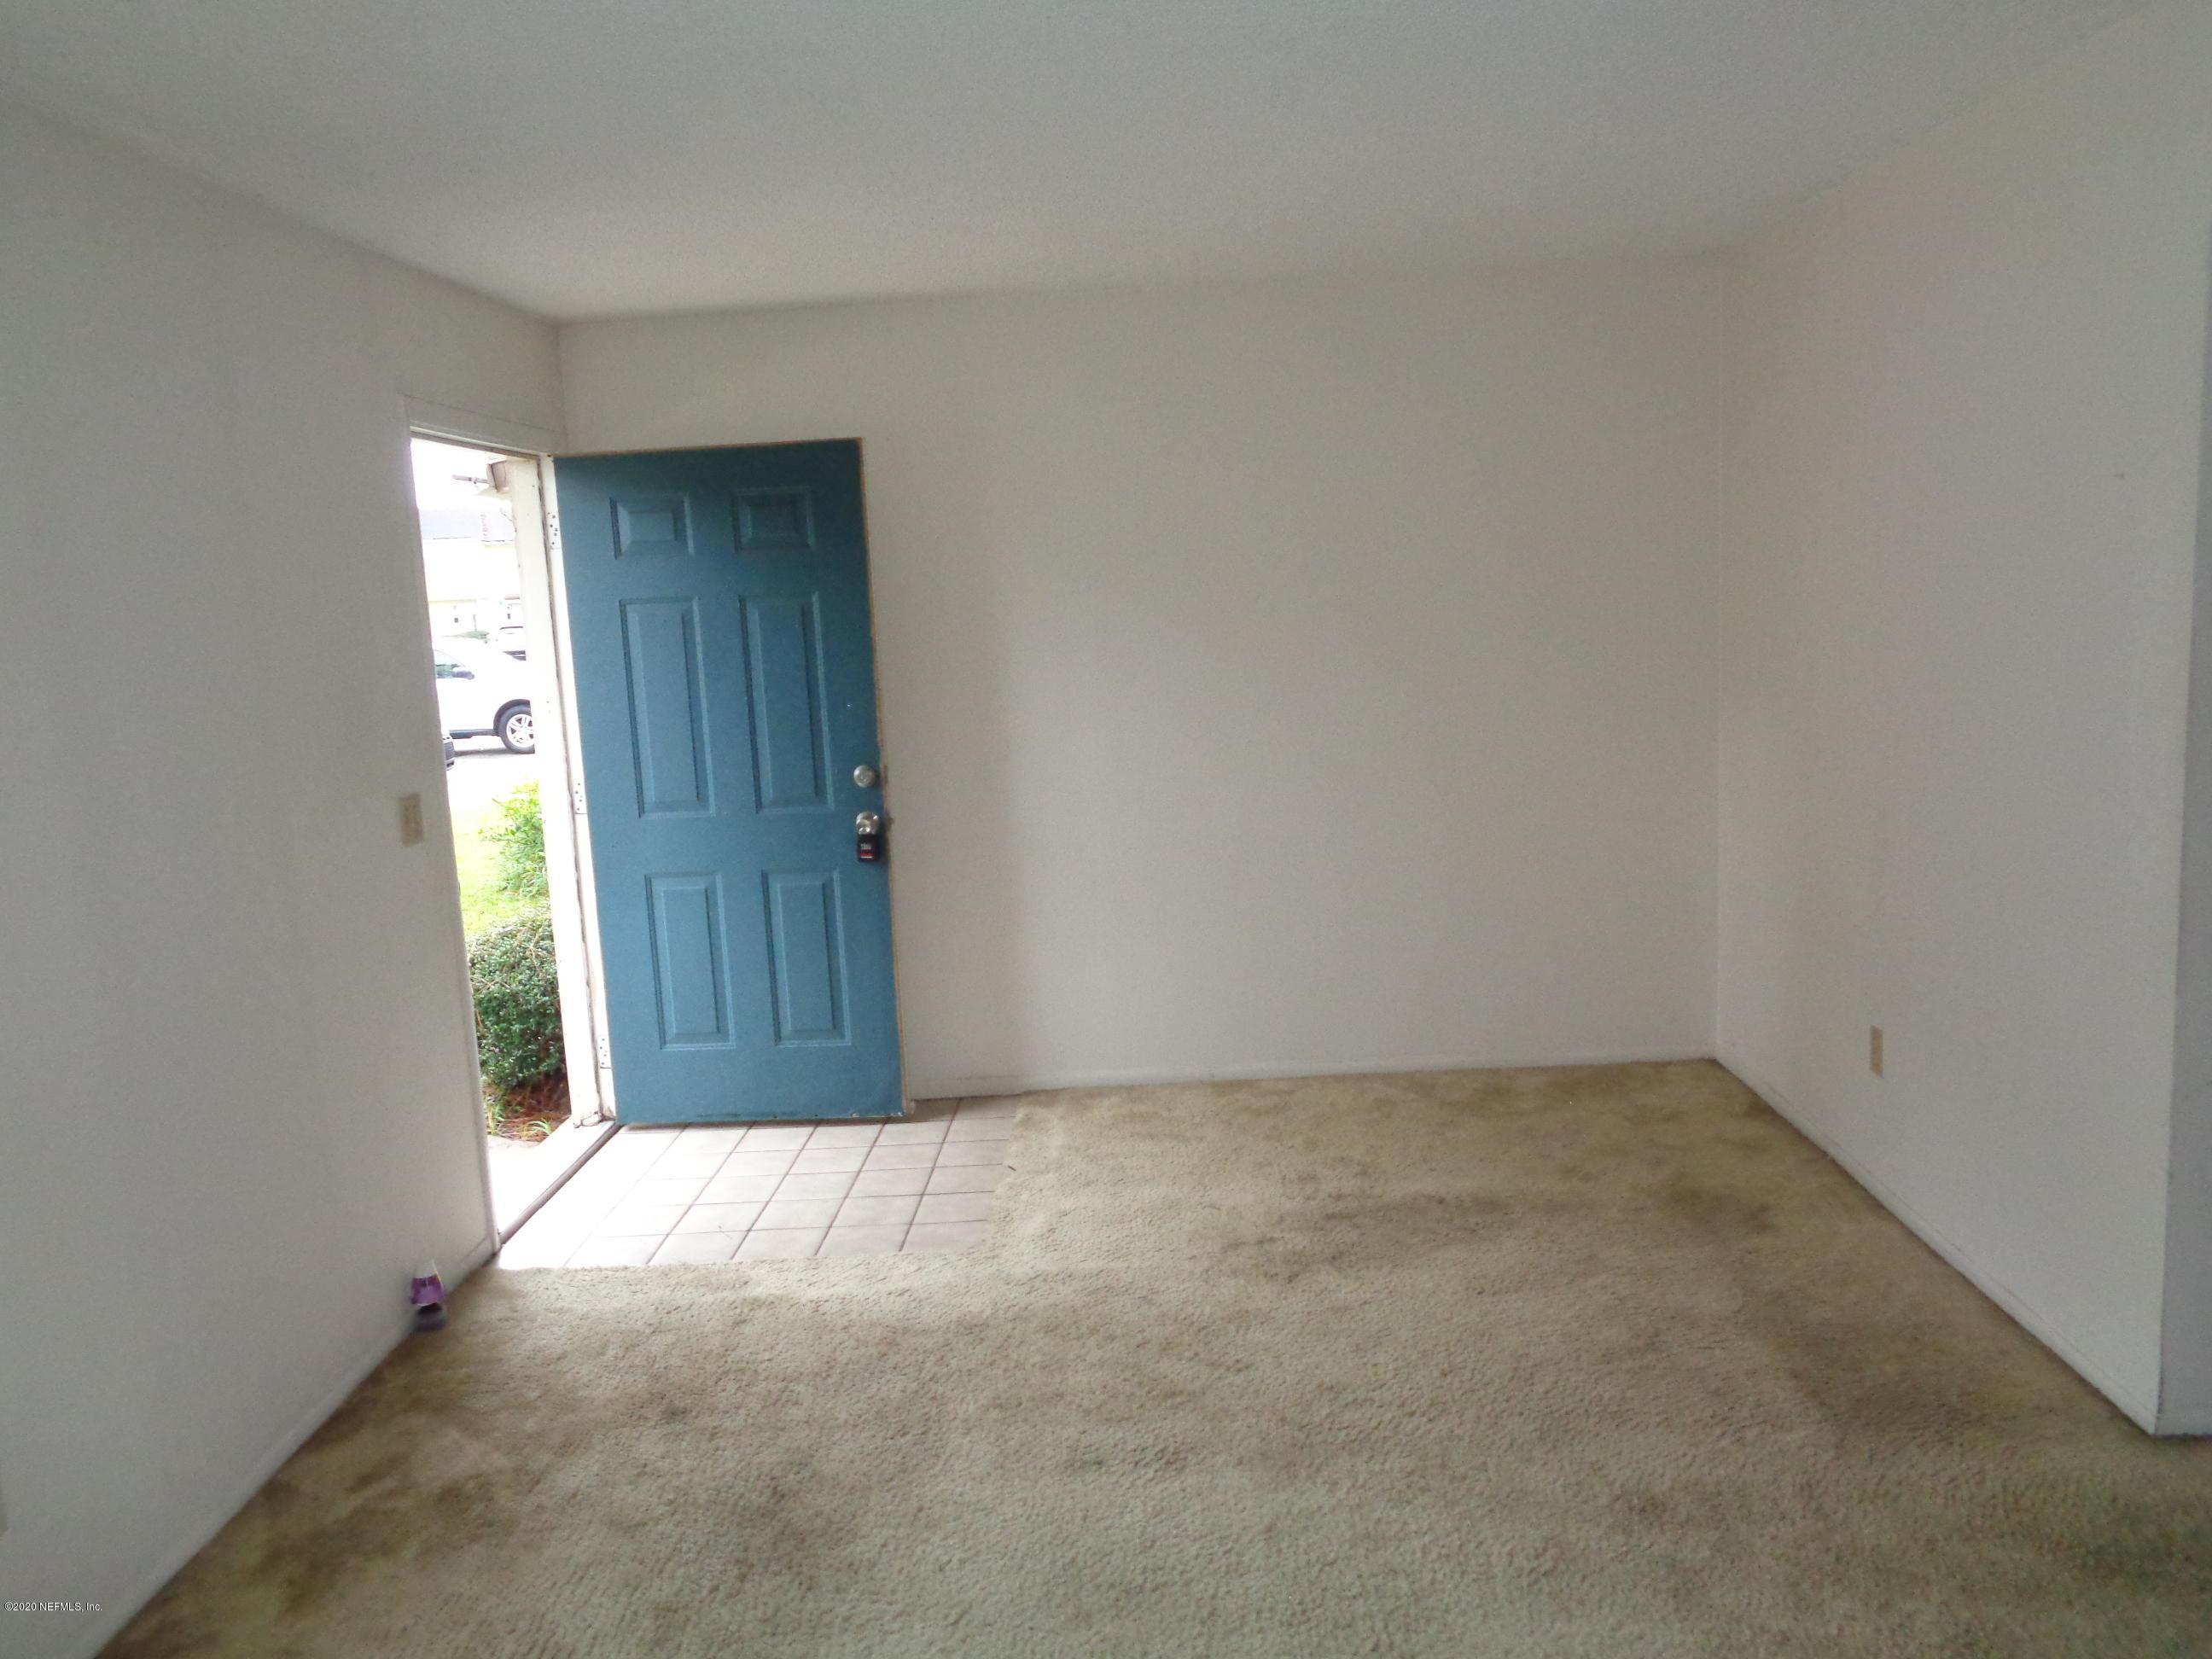 1852 WILLOWWOOD, JACKSONVILLE, FLORIDA 32225, 2 Bedrooms Bedrooms, ,2 BathroomsBathrooms,Residential,For sale,WILLOWWOOD,1083871